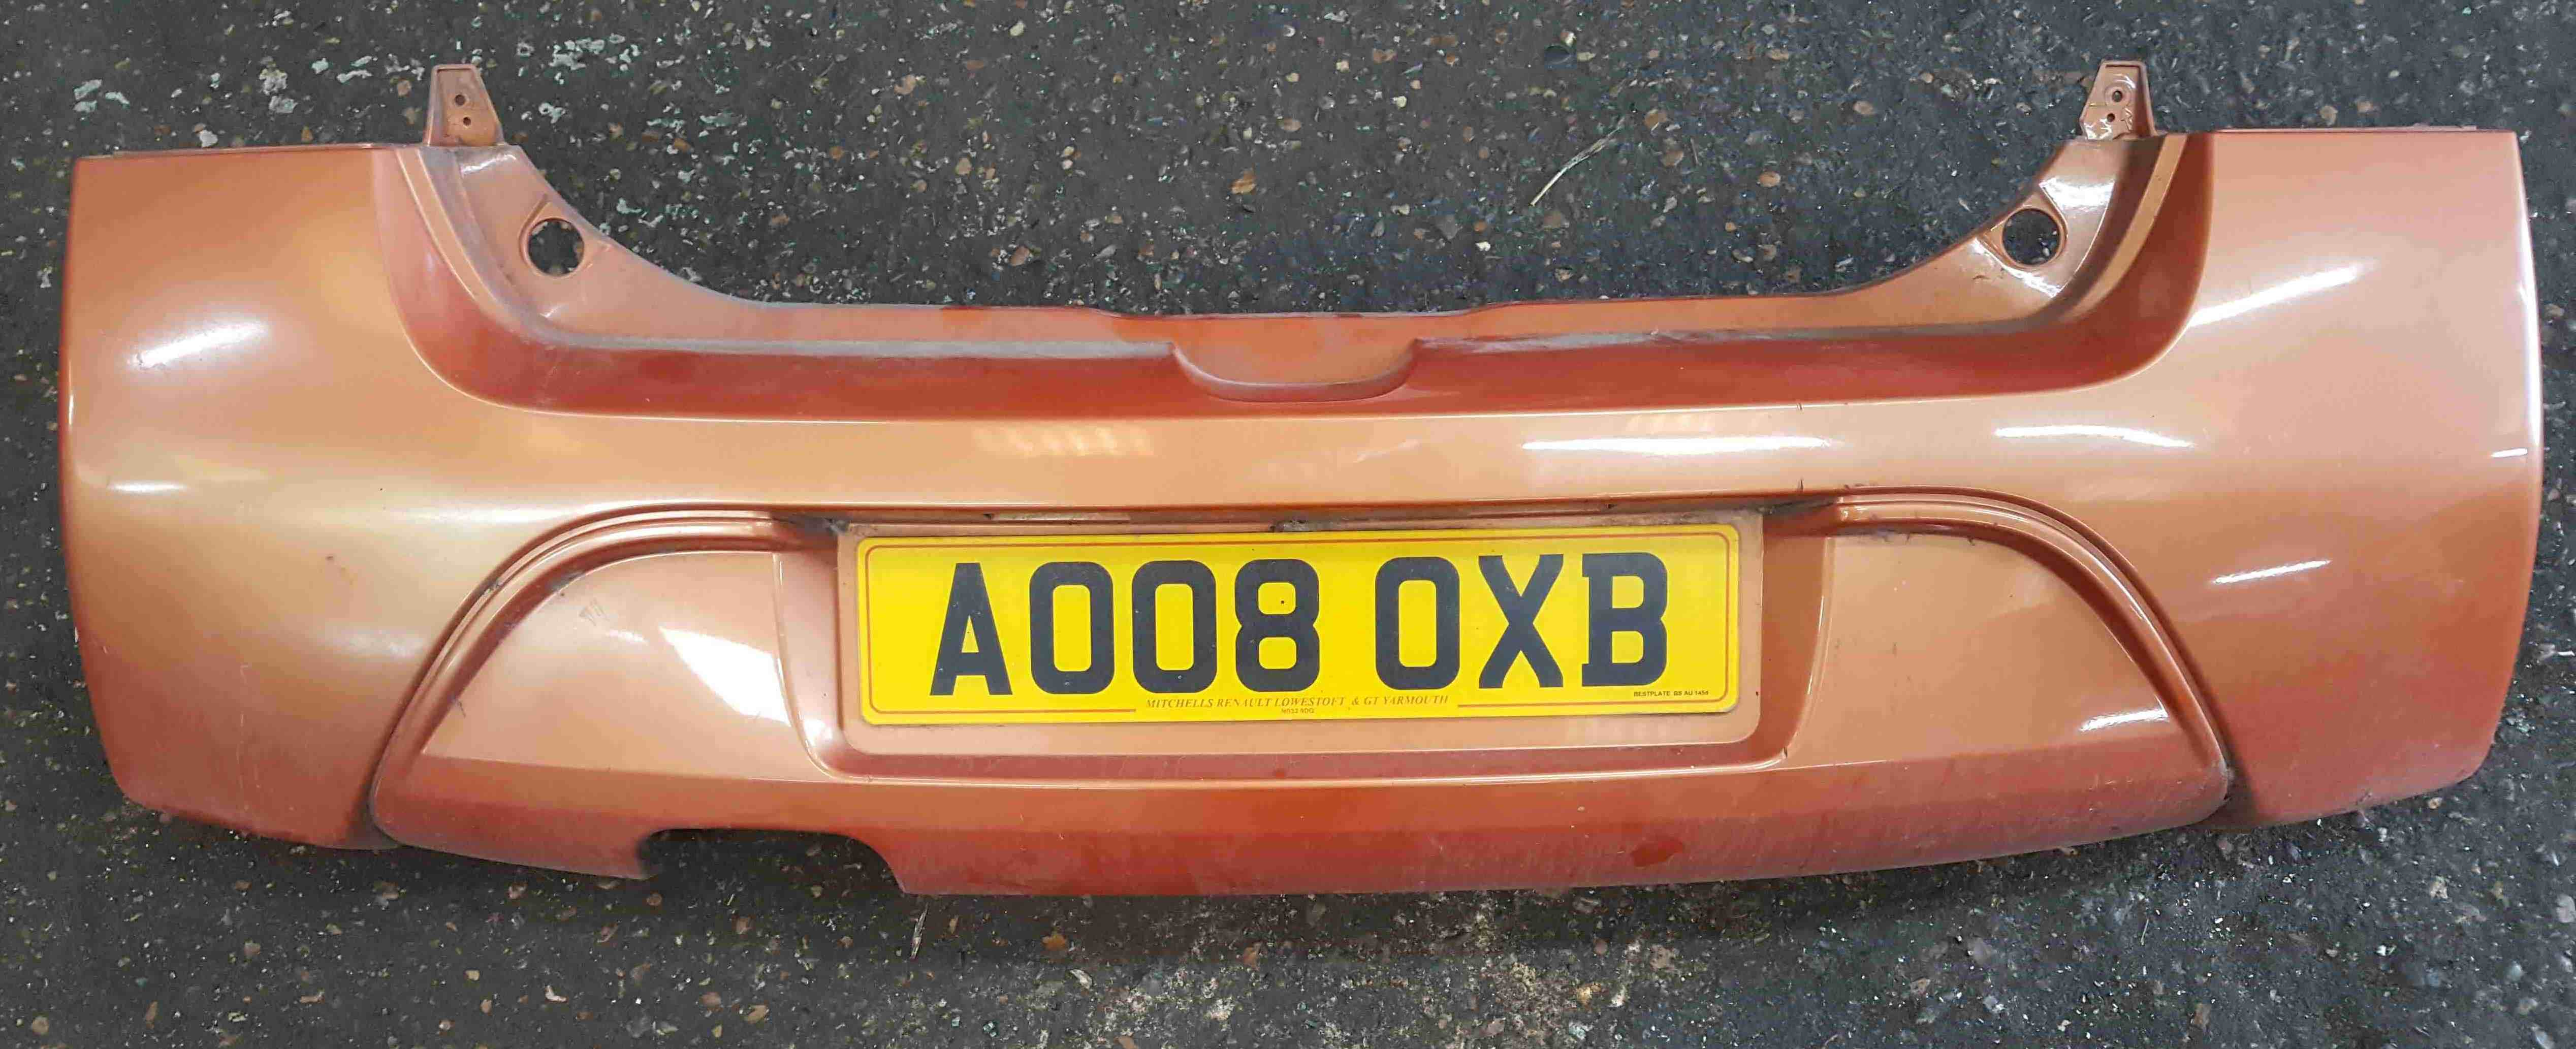 Renault Twingo 2007-2011 Rear Bumper Orange TEENC